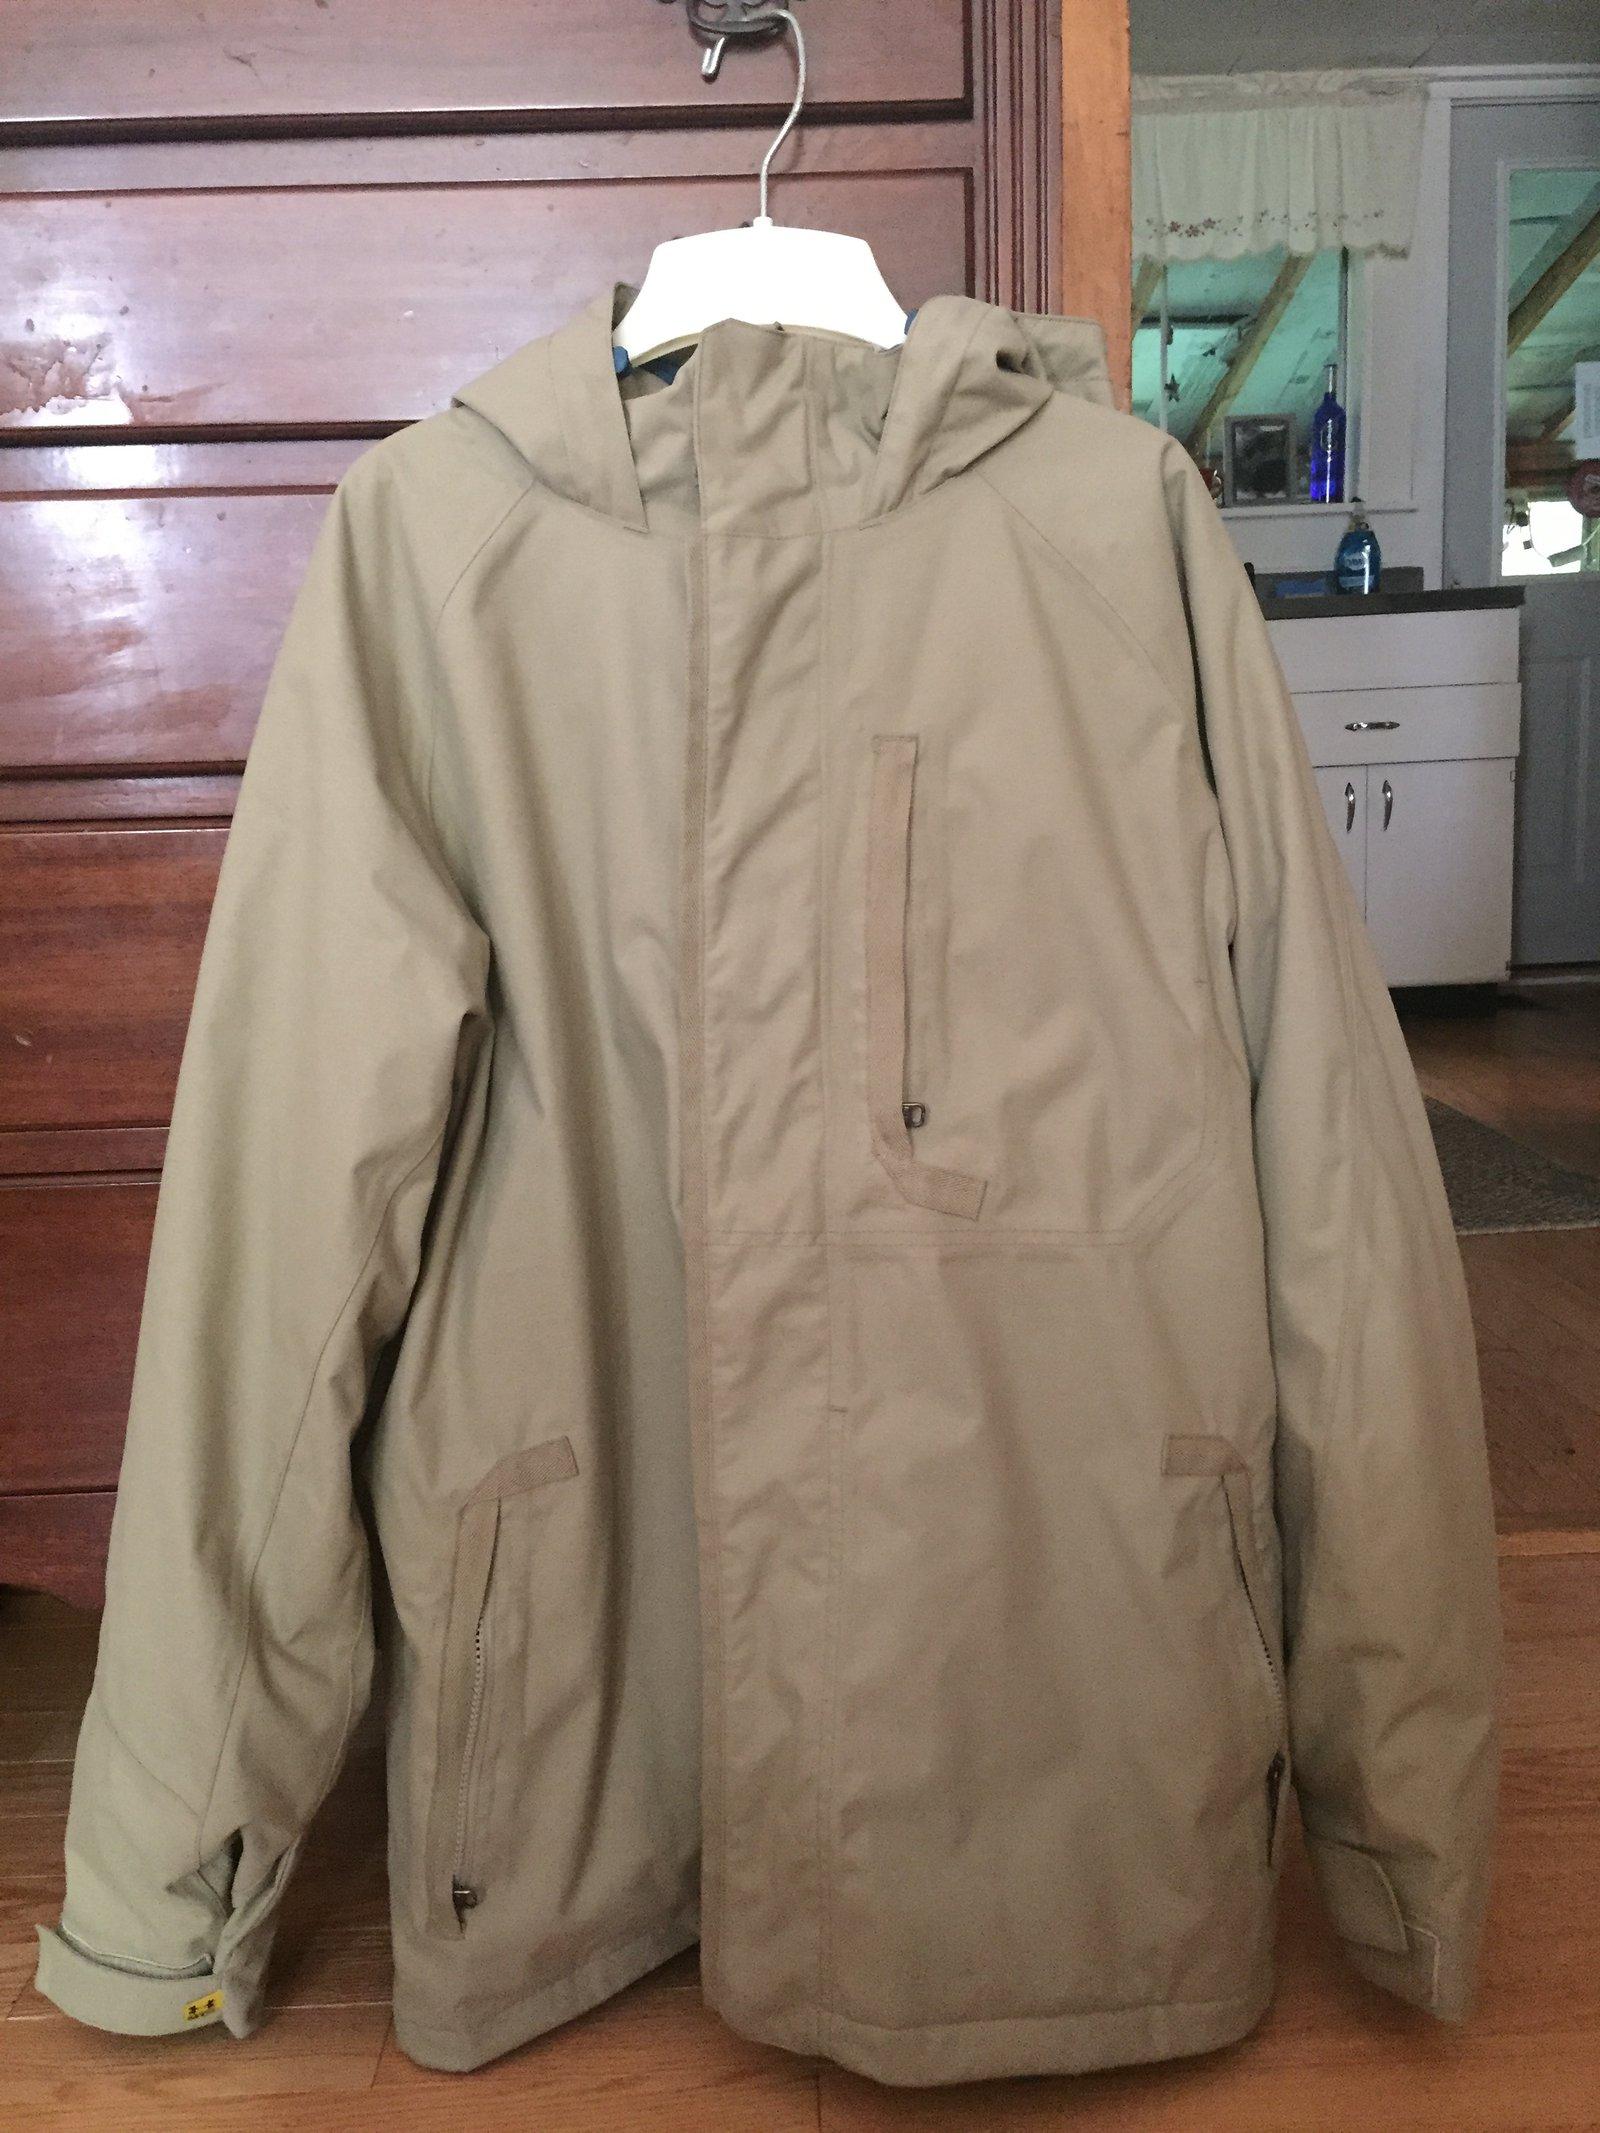 Under Armour Jacket (Large)